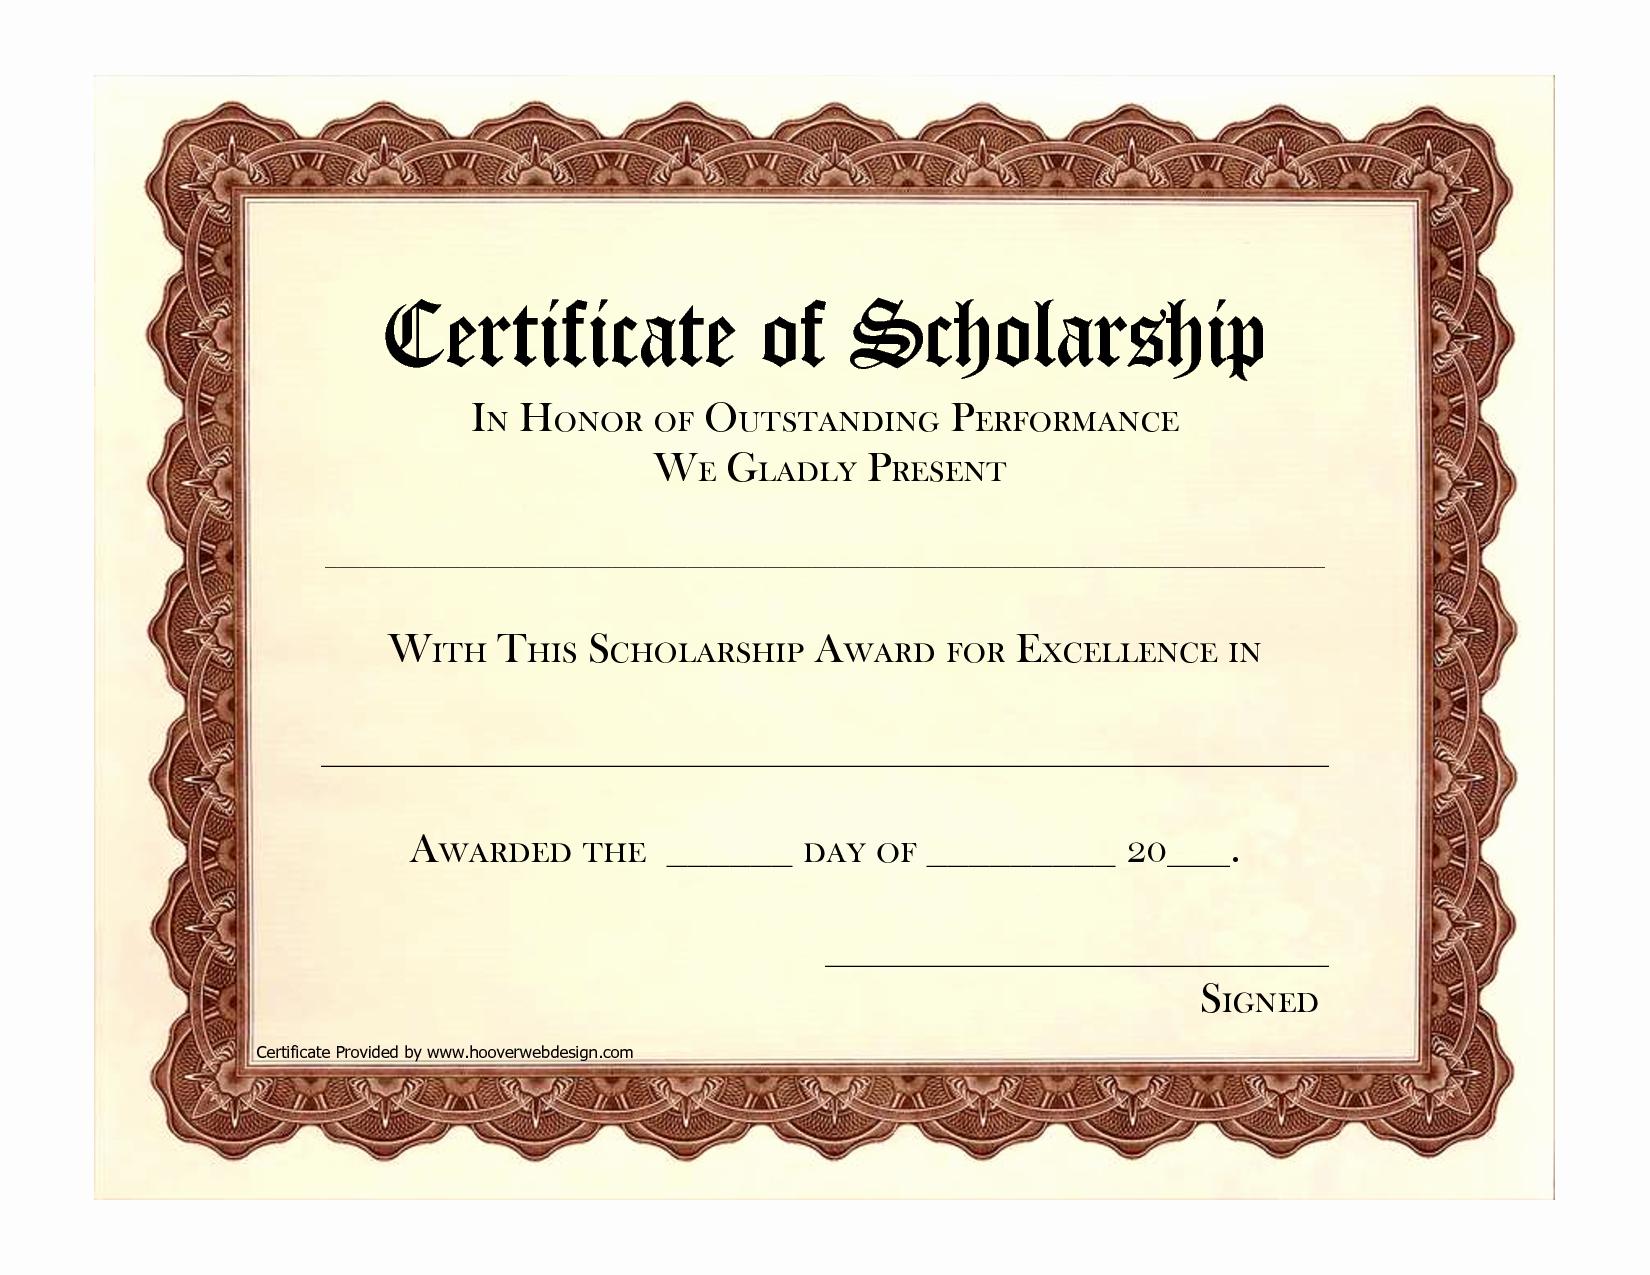 Free Download Award Certificate Templates Awesome Award Certificate Template Free Scholarship Award